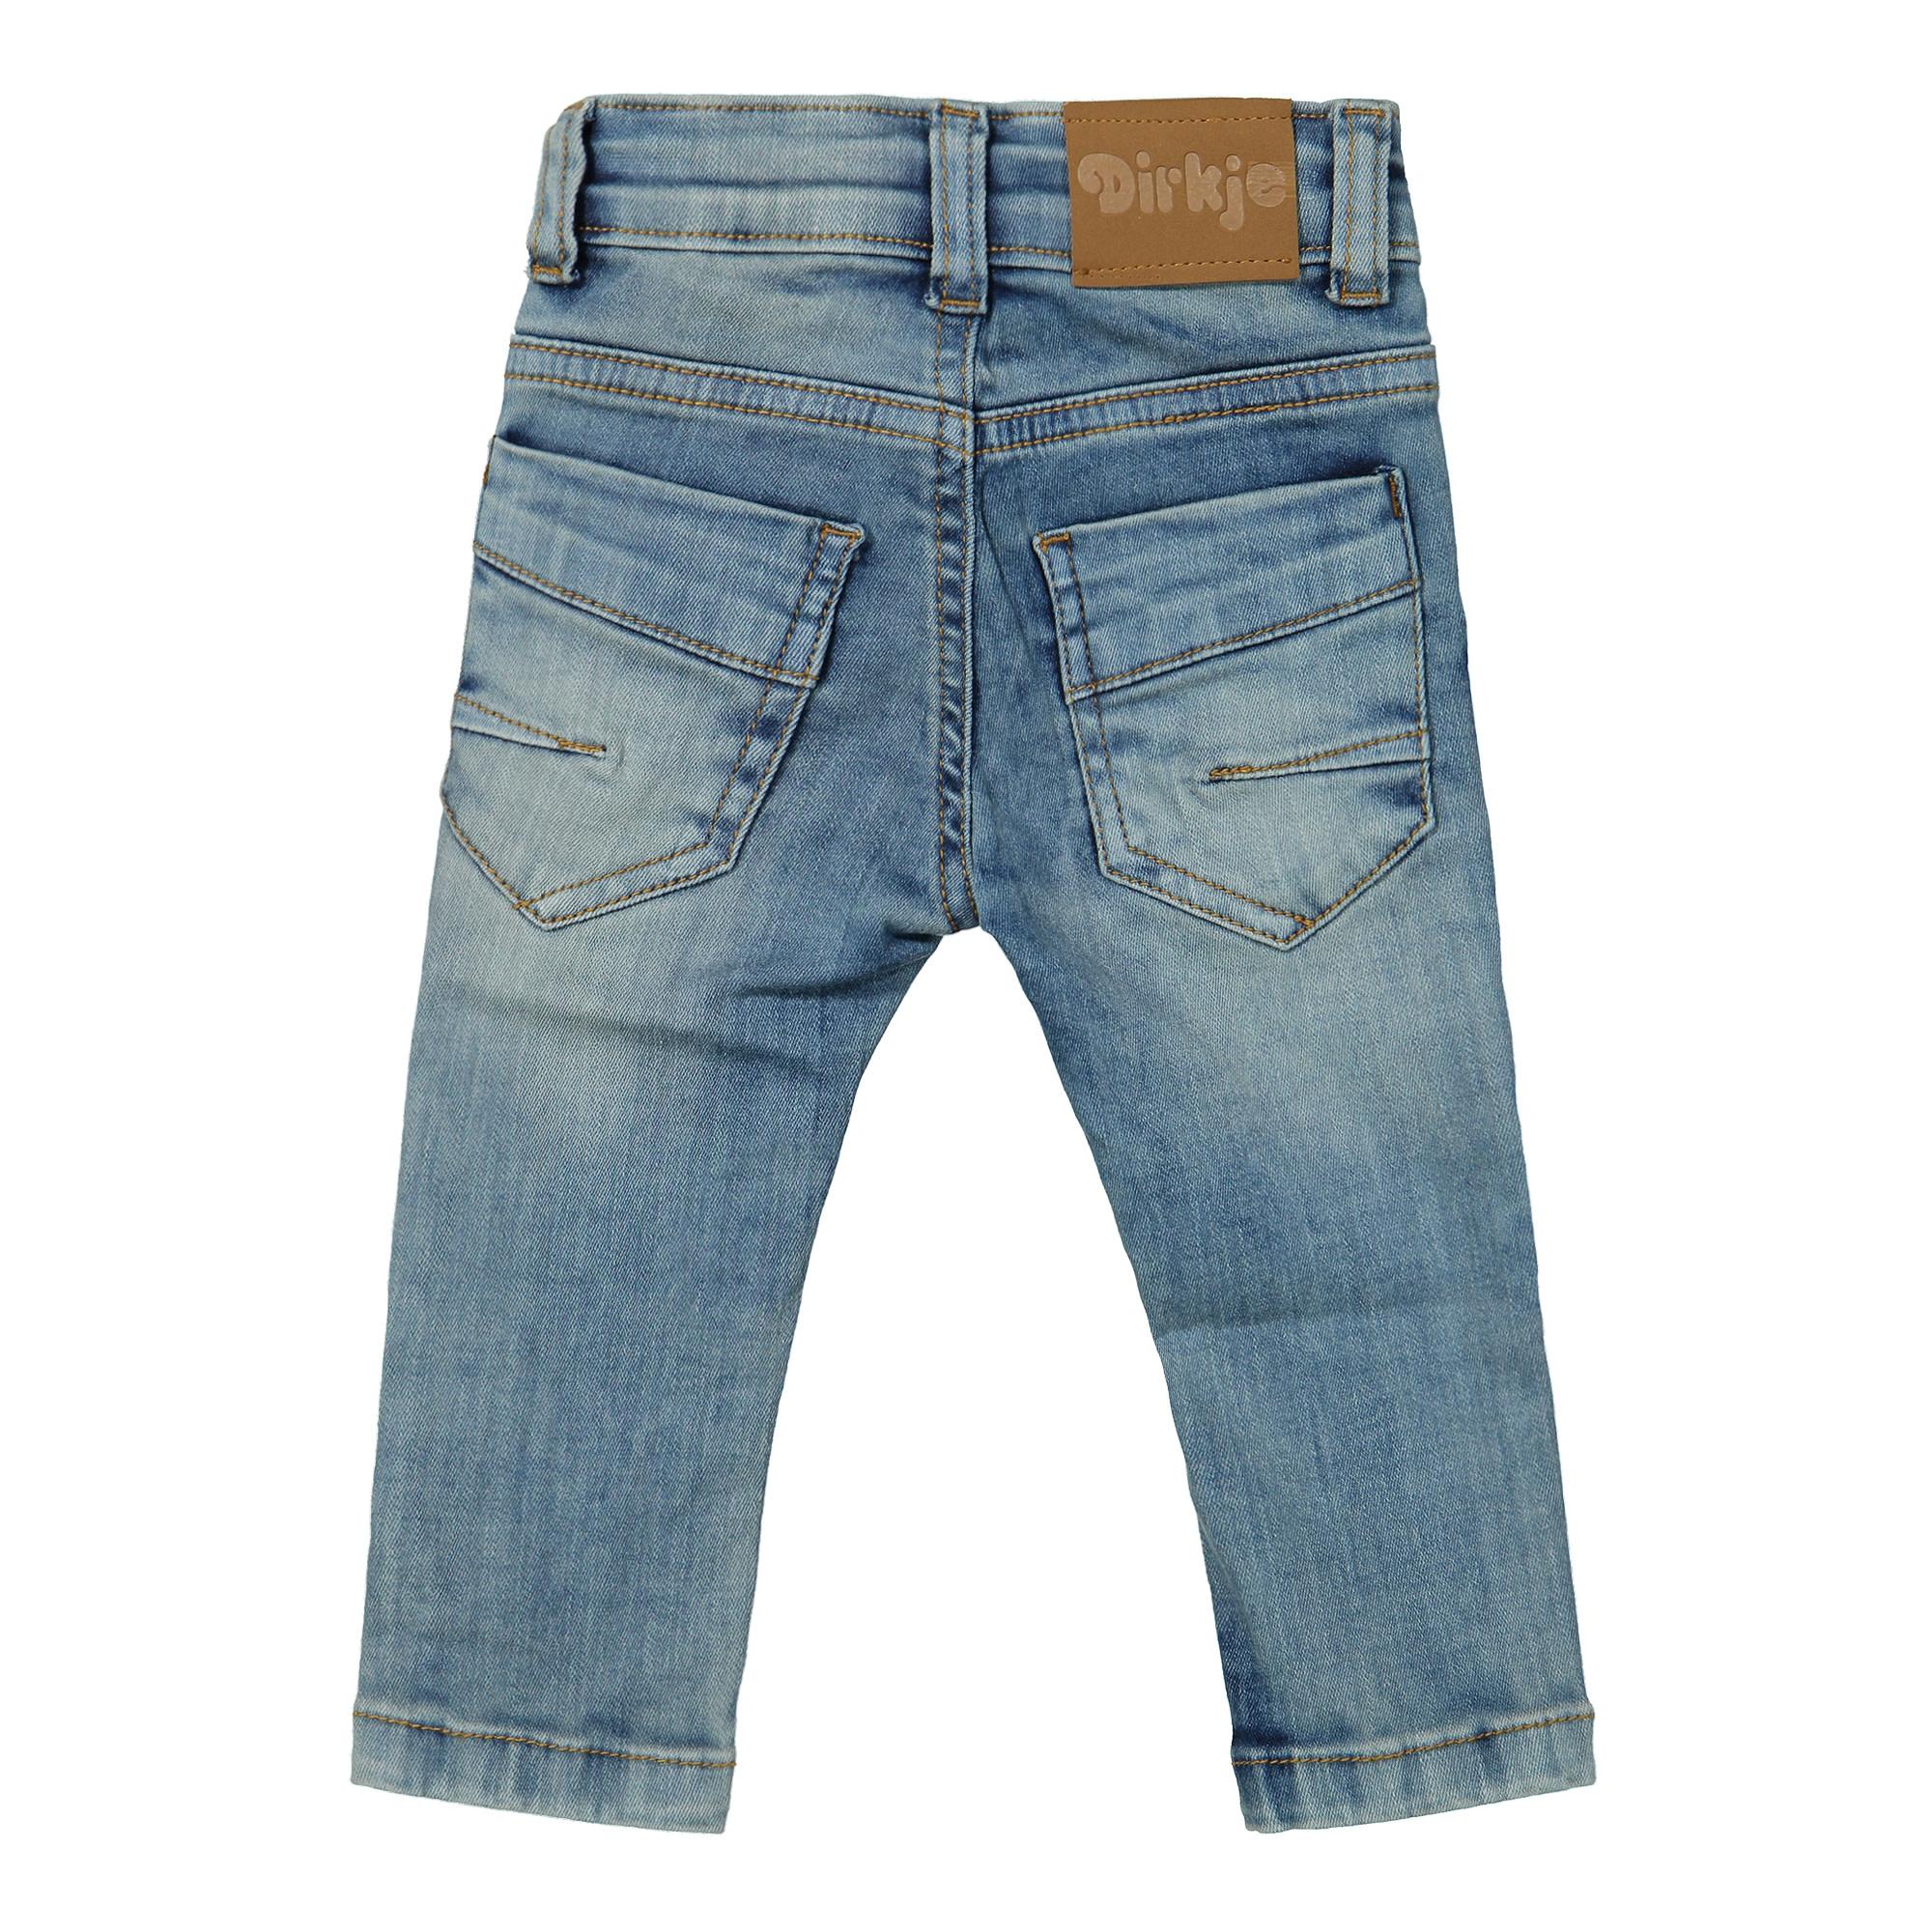 Boys Light Wash Jeans